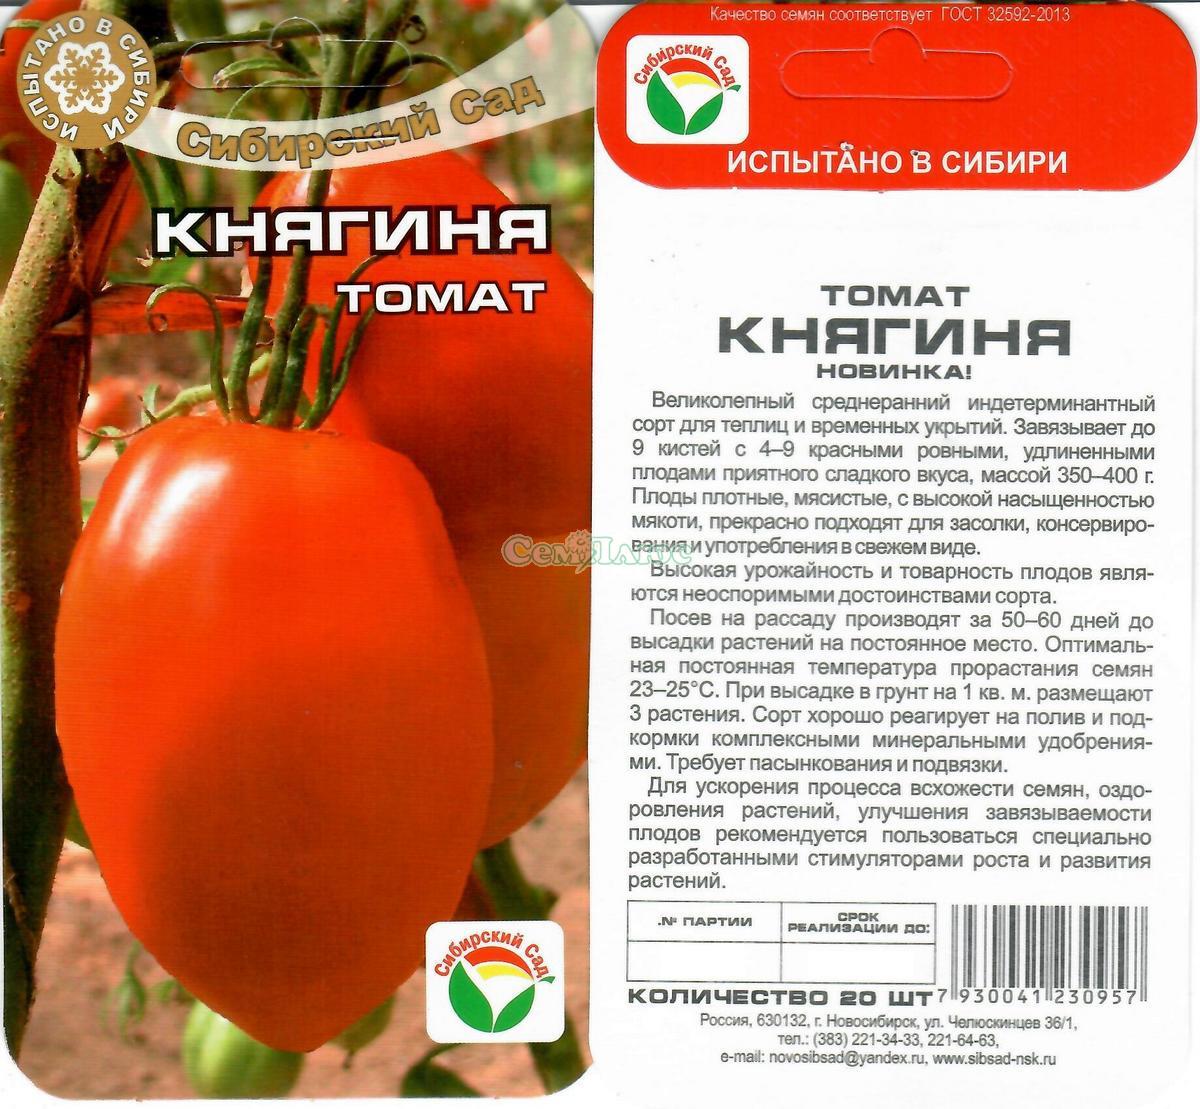 Описание аристократического томата Княгиня и правила выращивания гибридного сорта